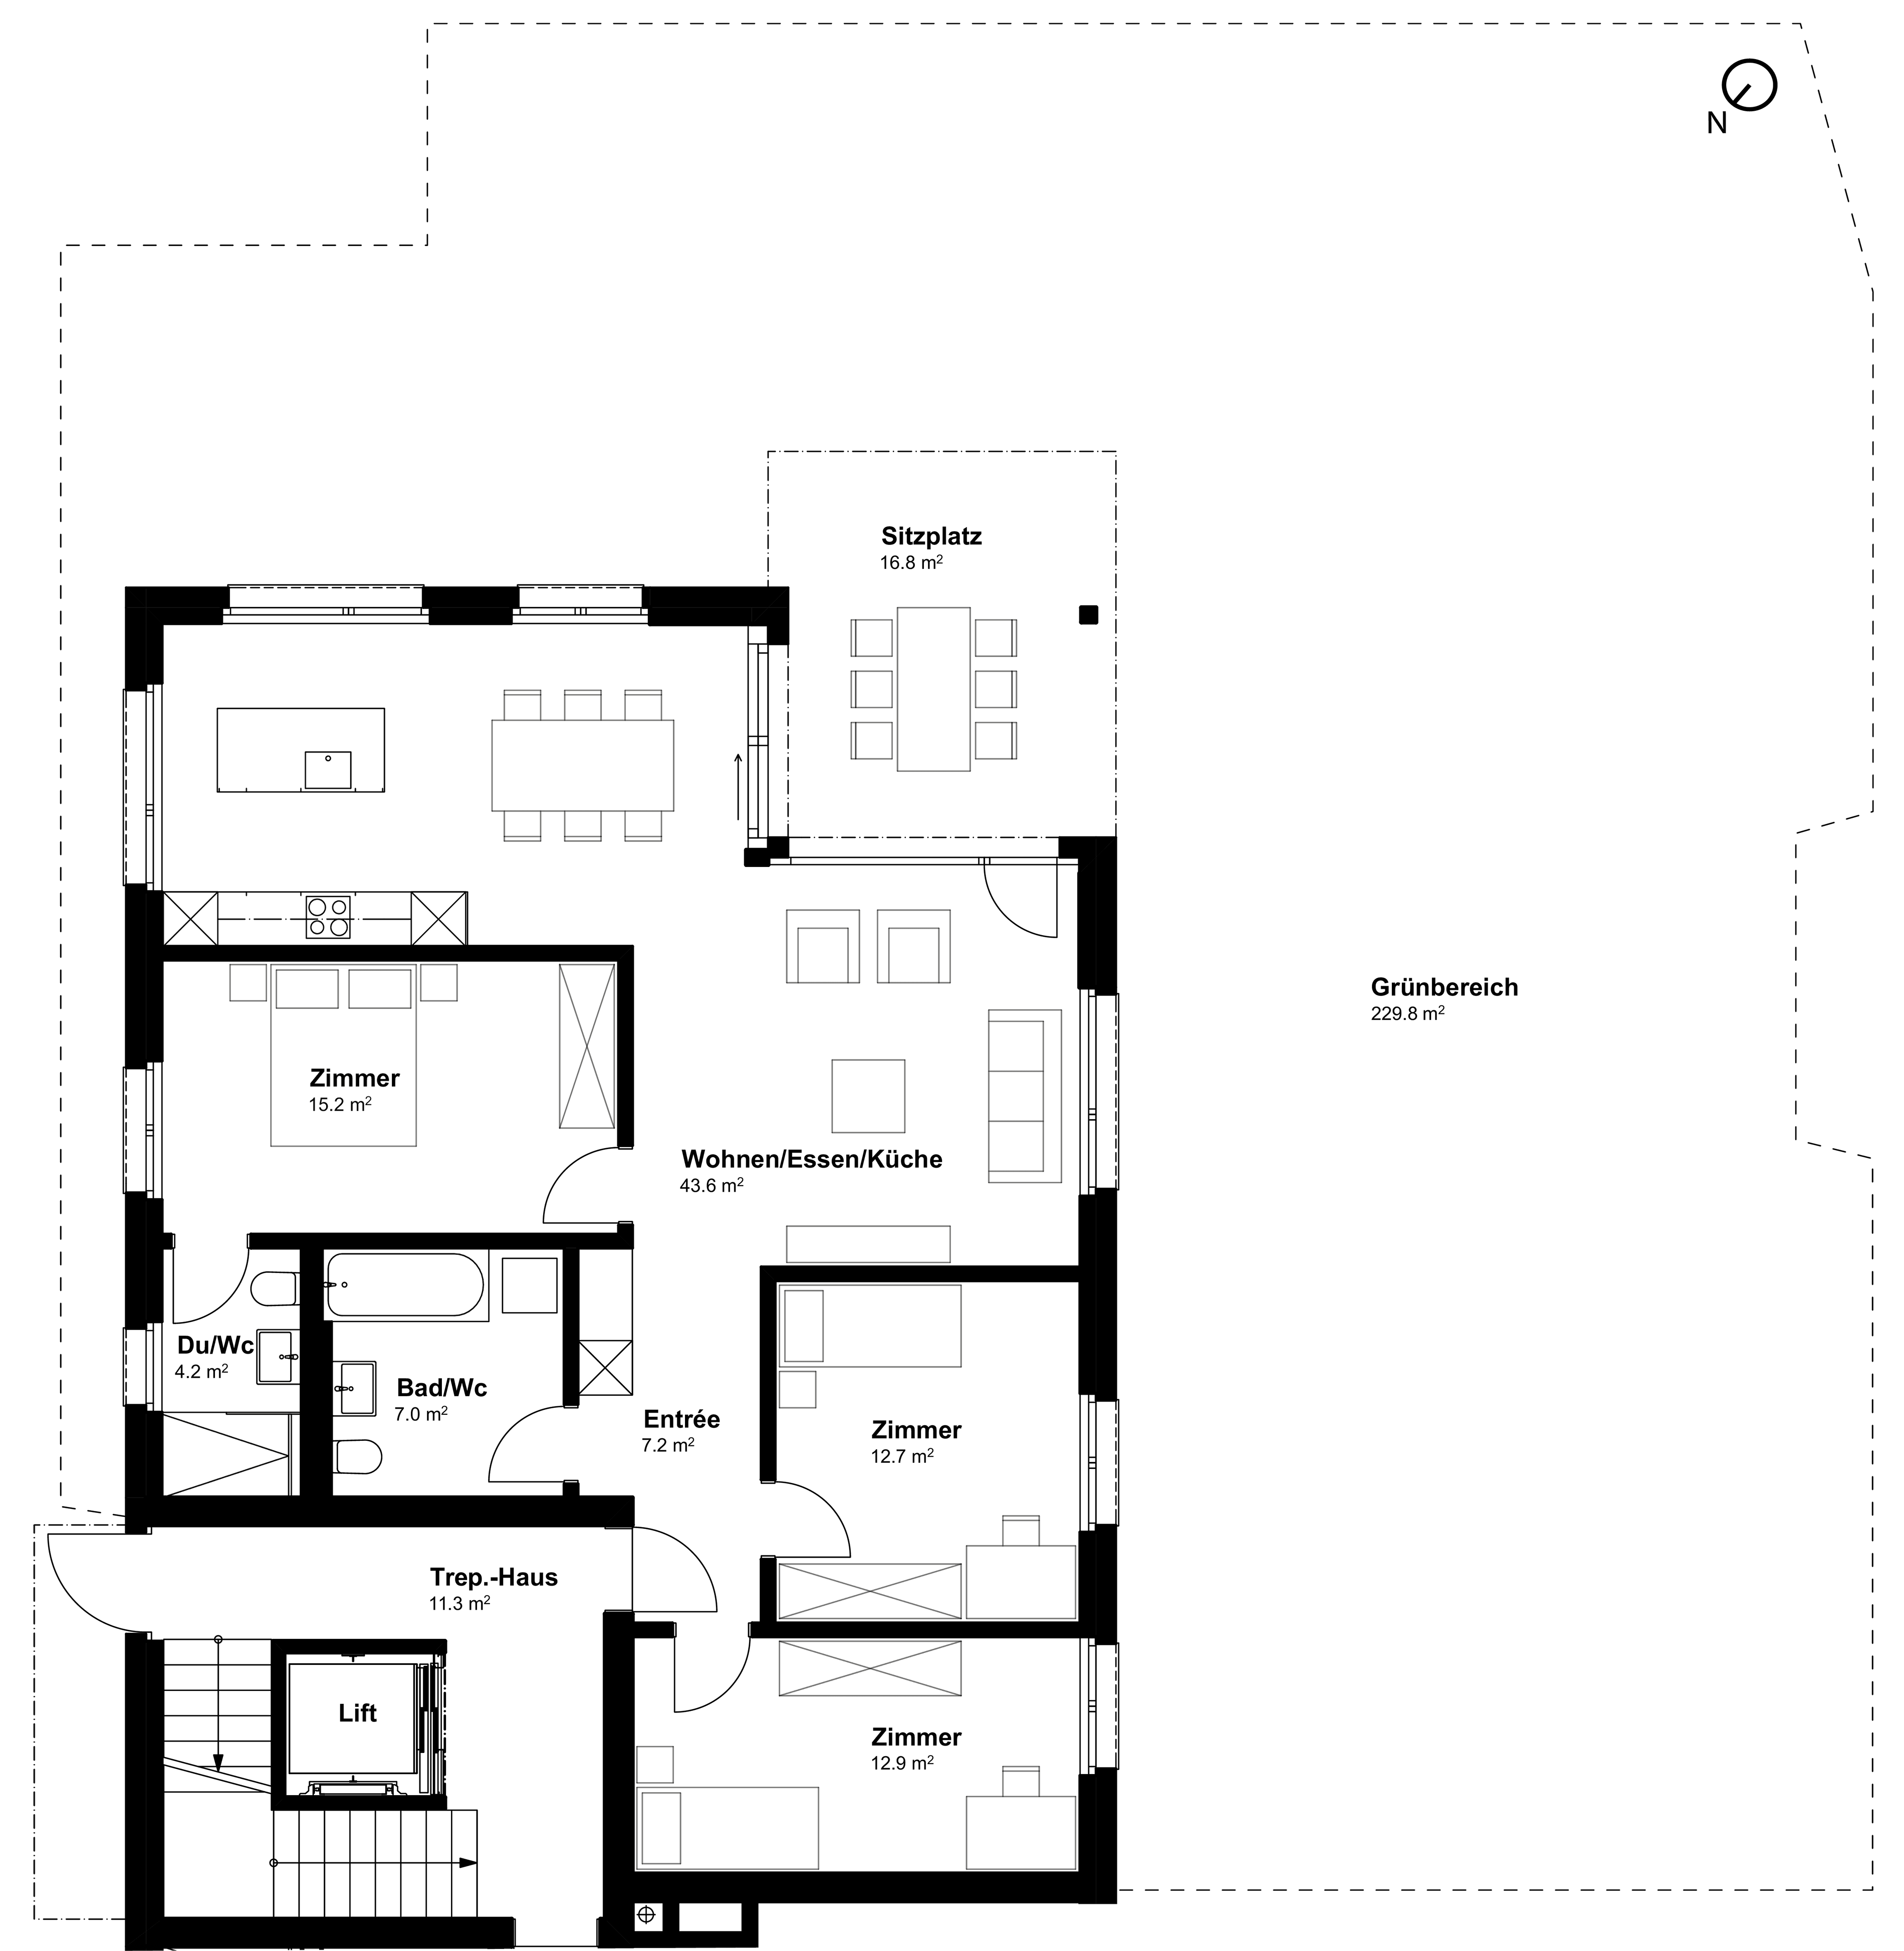 E01 - murgau – Dabei sein wo neues entsteht.